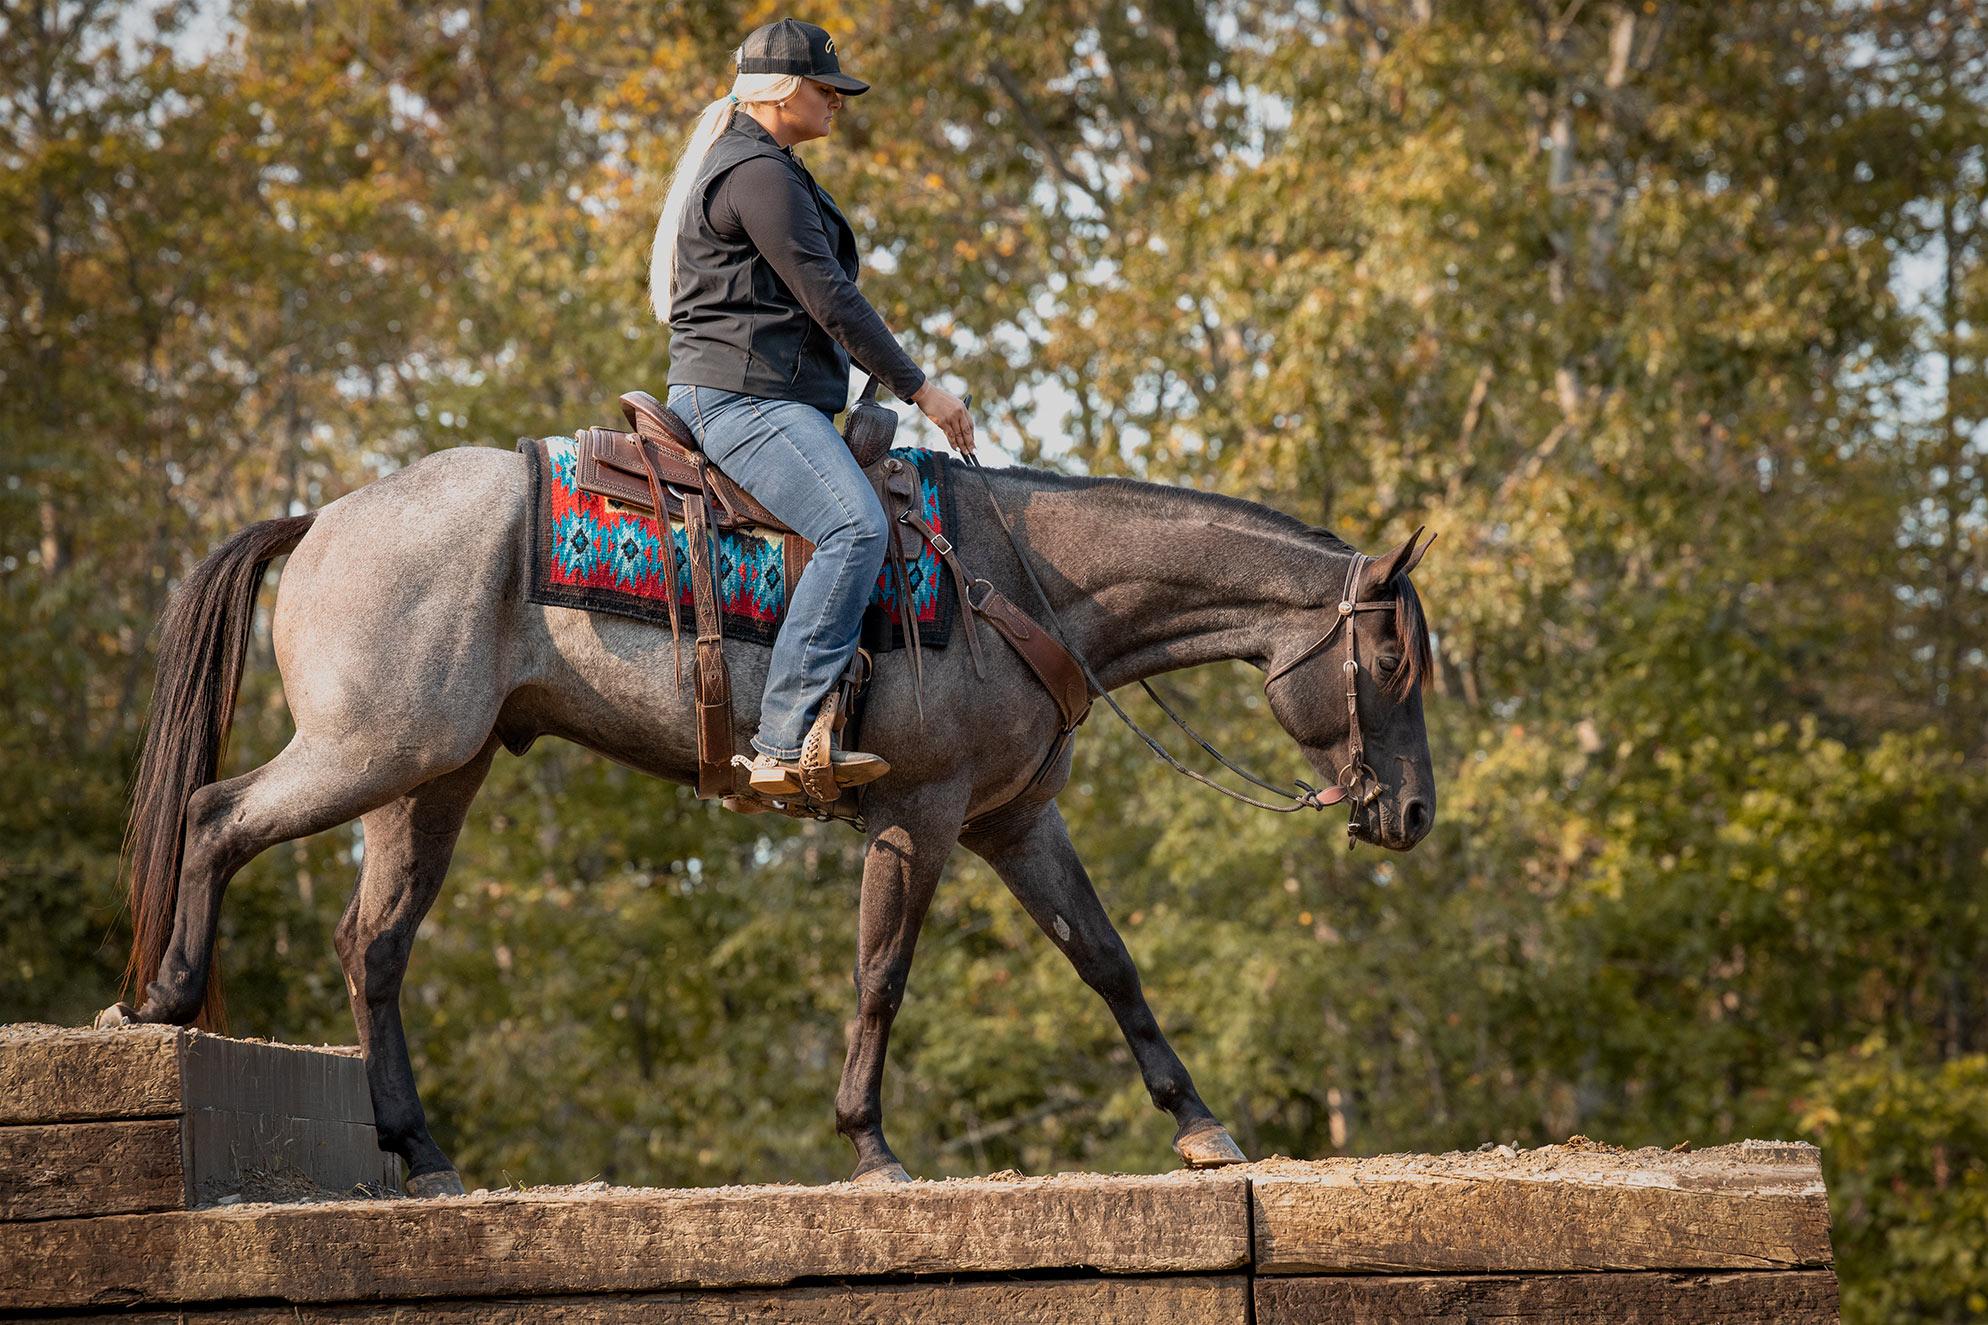 018-Gunsmoke-Luxury-Trail-Horse-For-Sale